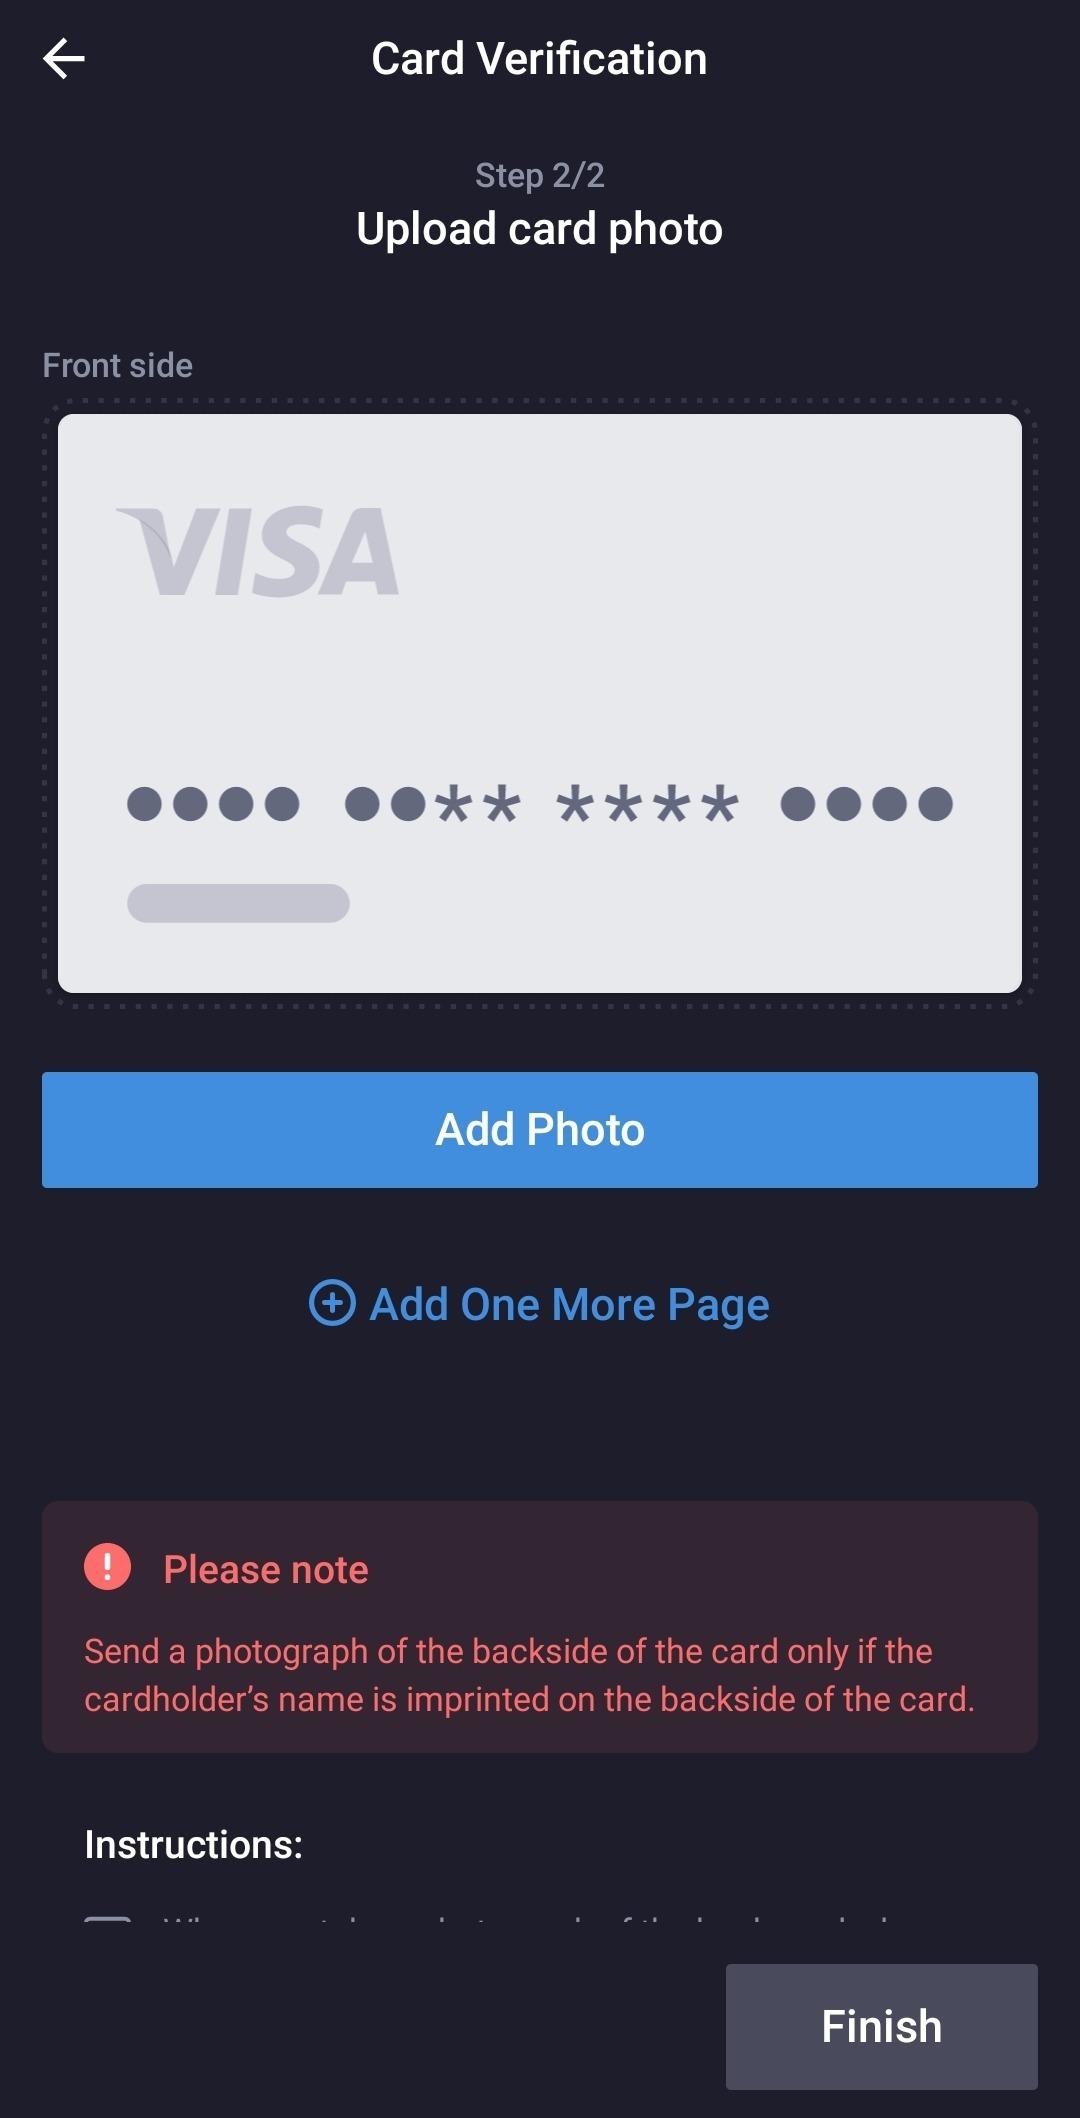 Card verification 2